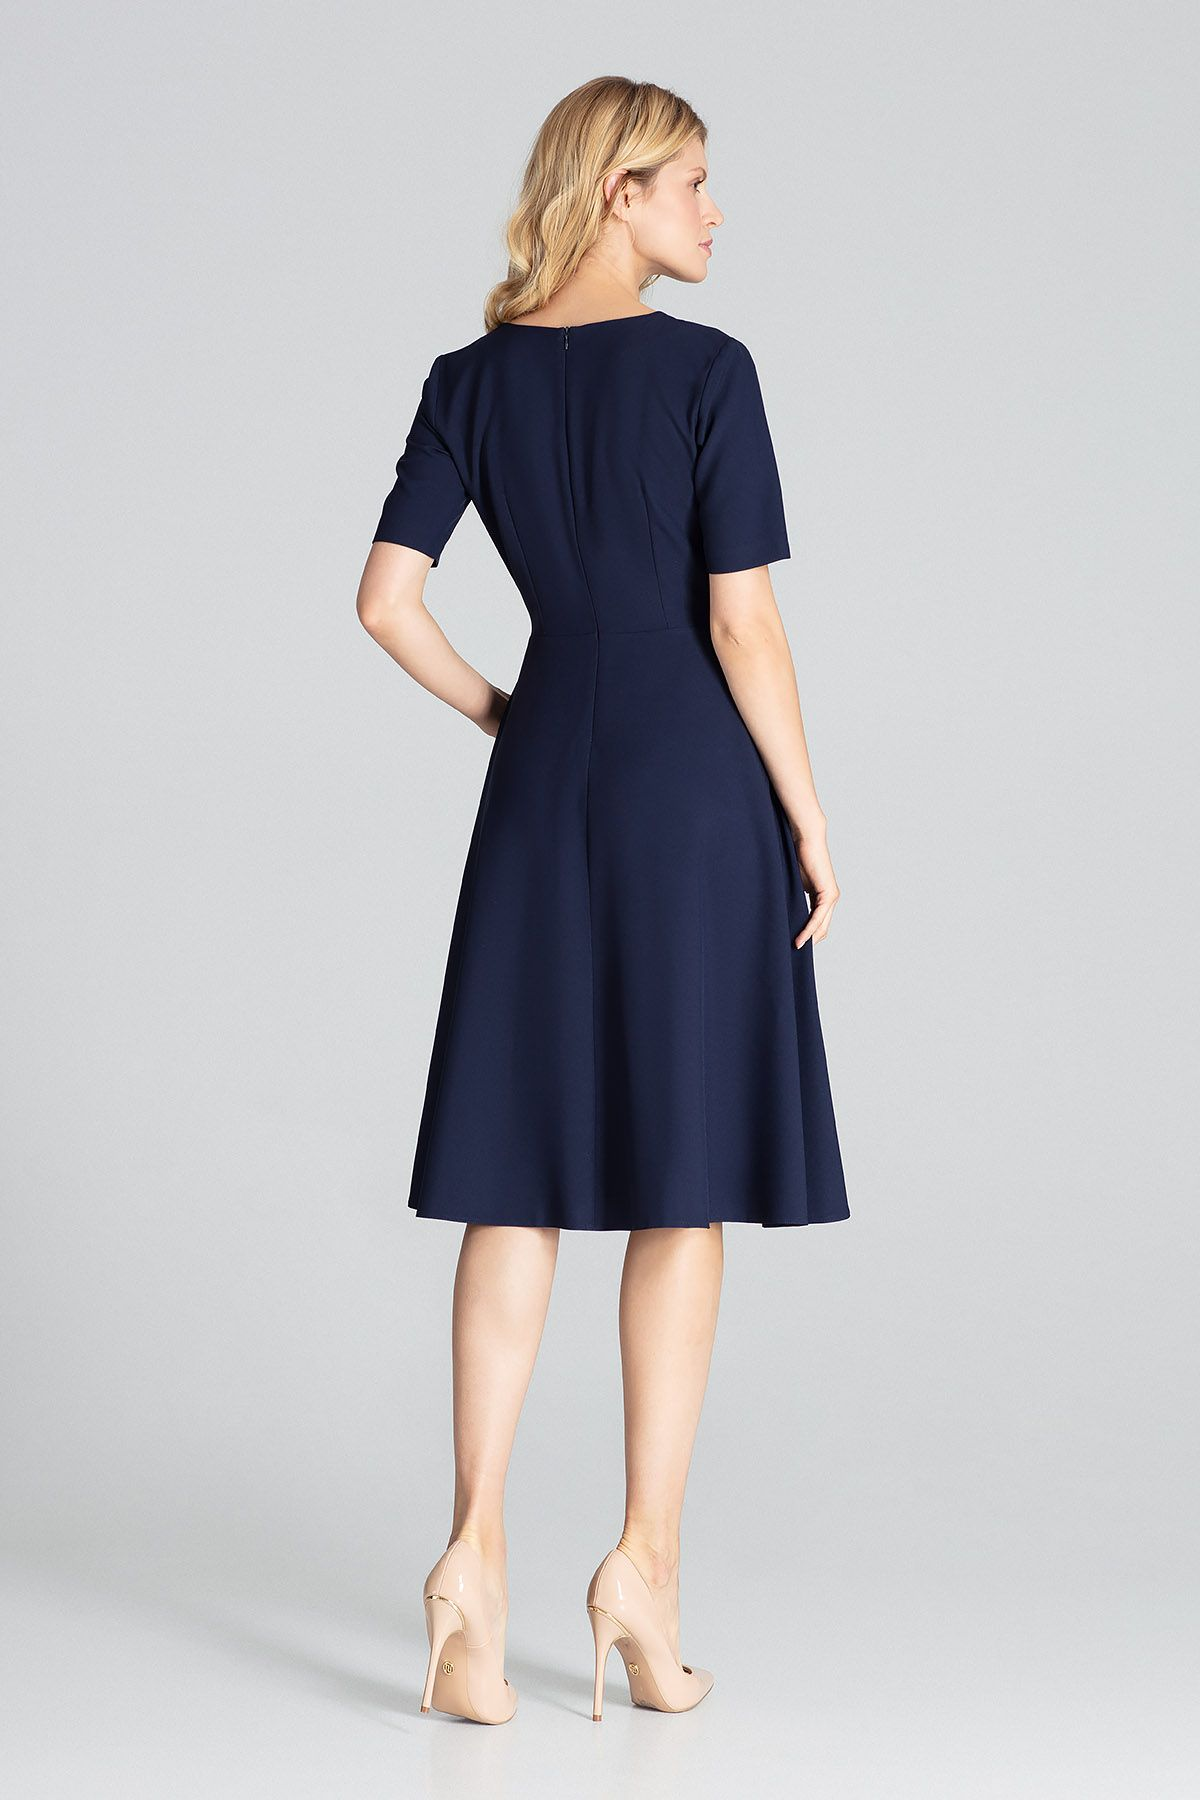 Navy Midi Dress with Short Sleeves